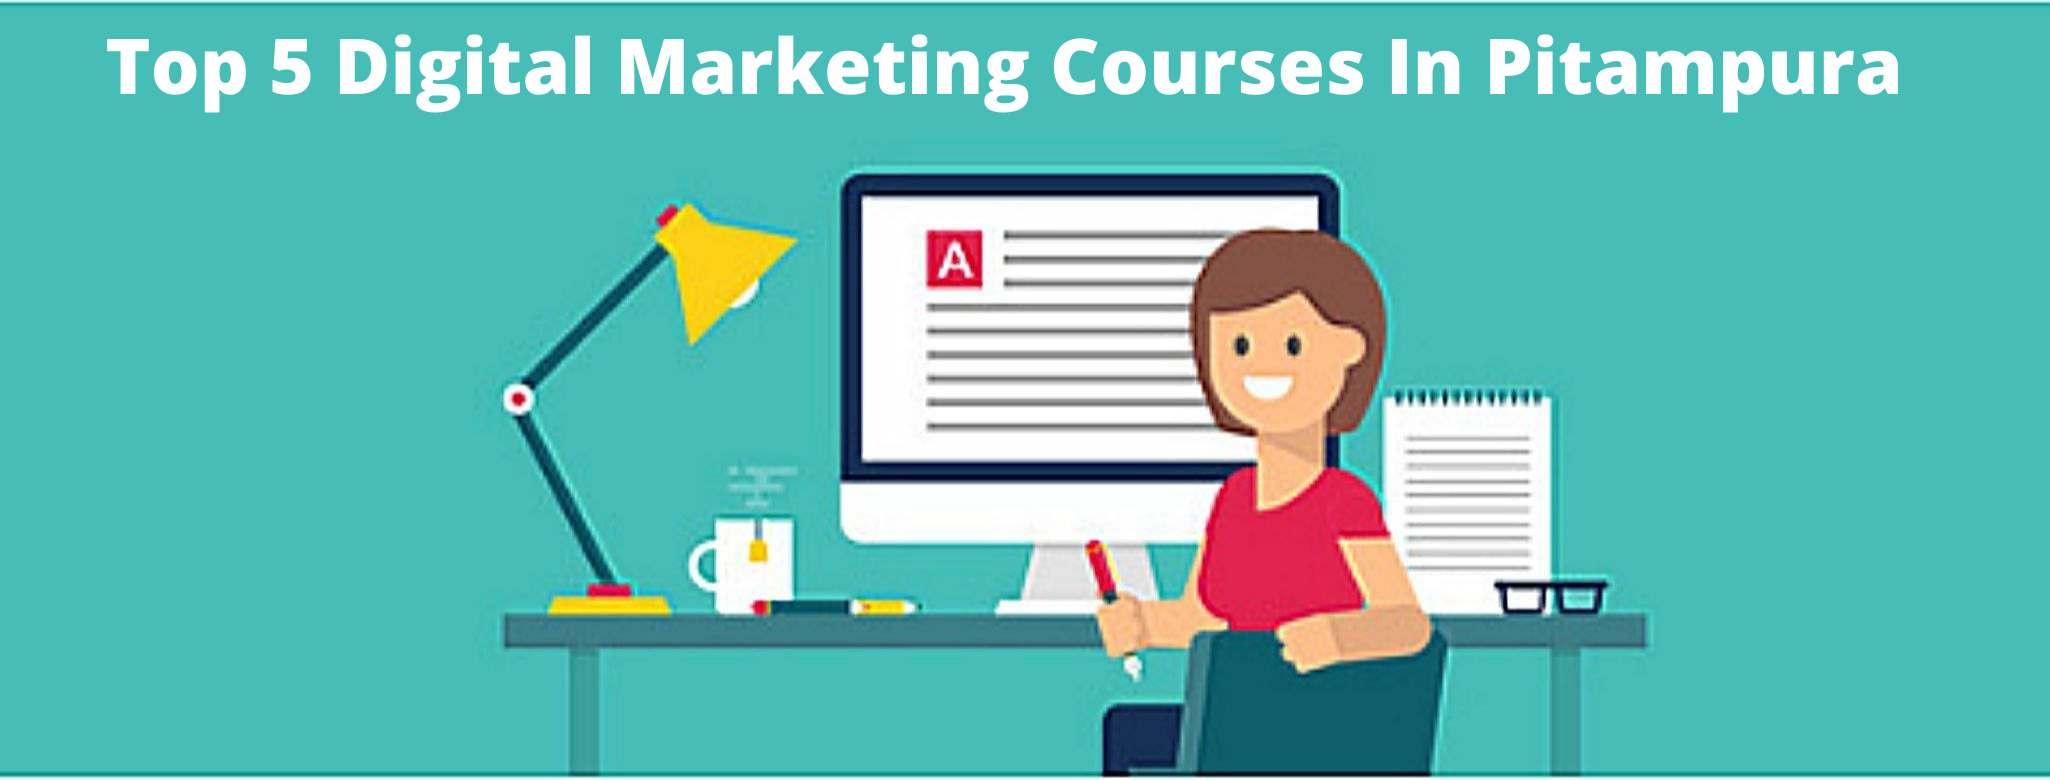 Digital-Marketing-Courses-in-Pitampura.jpg